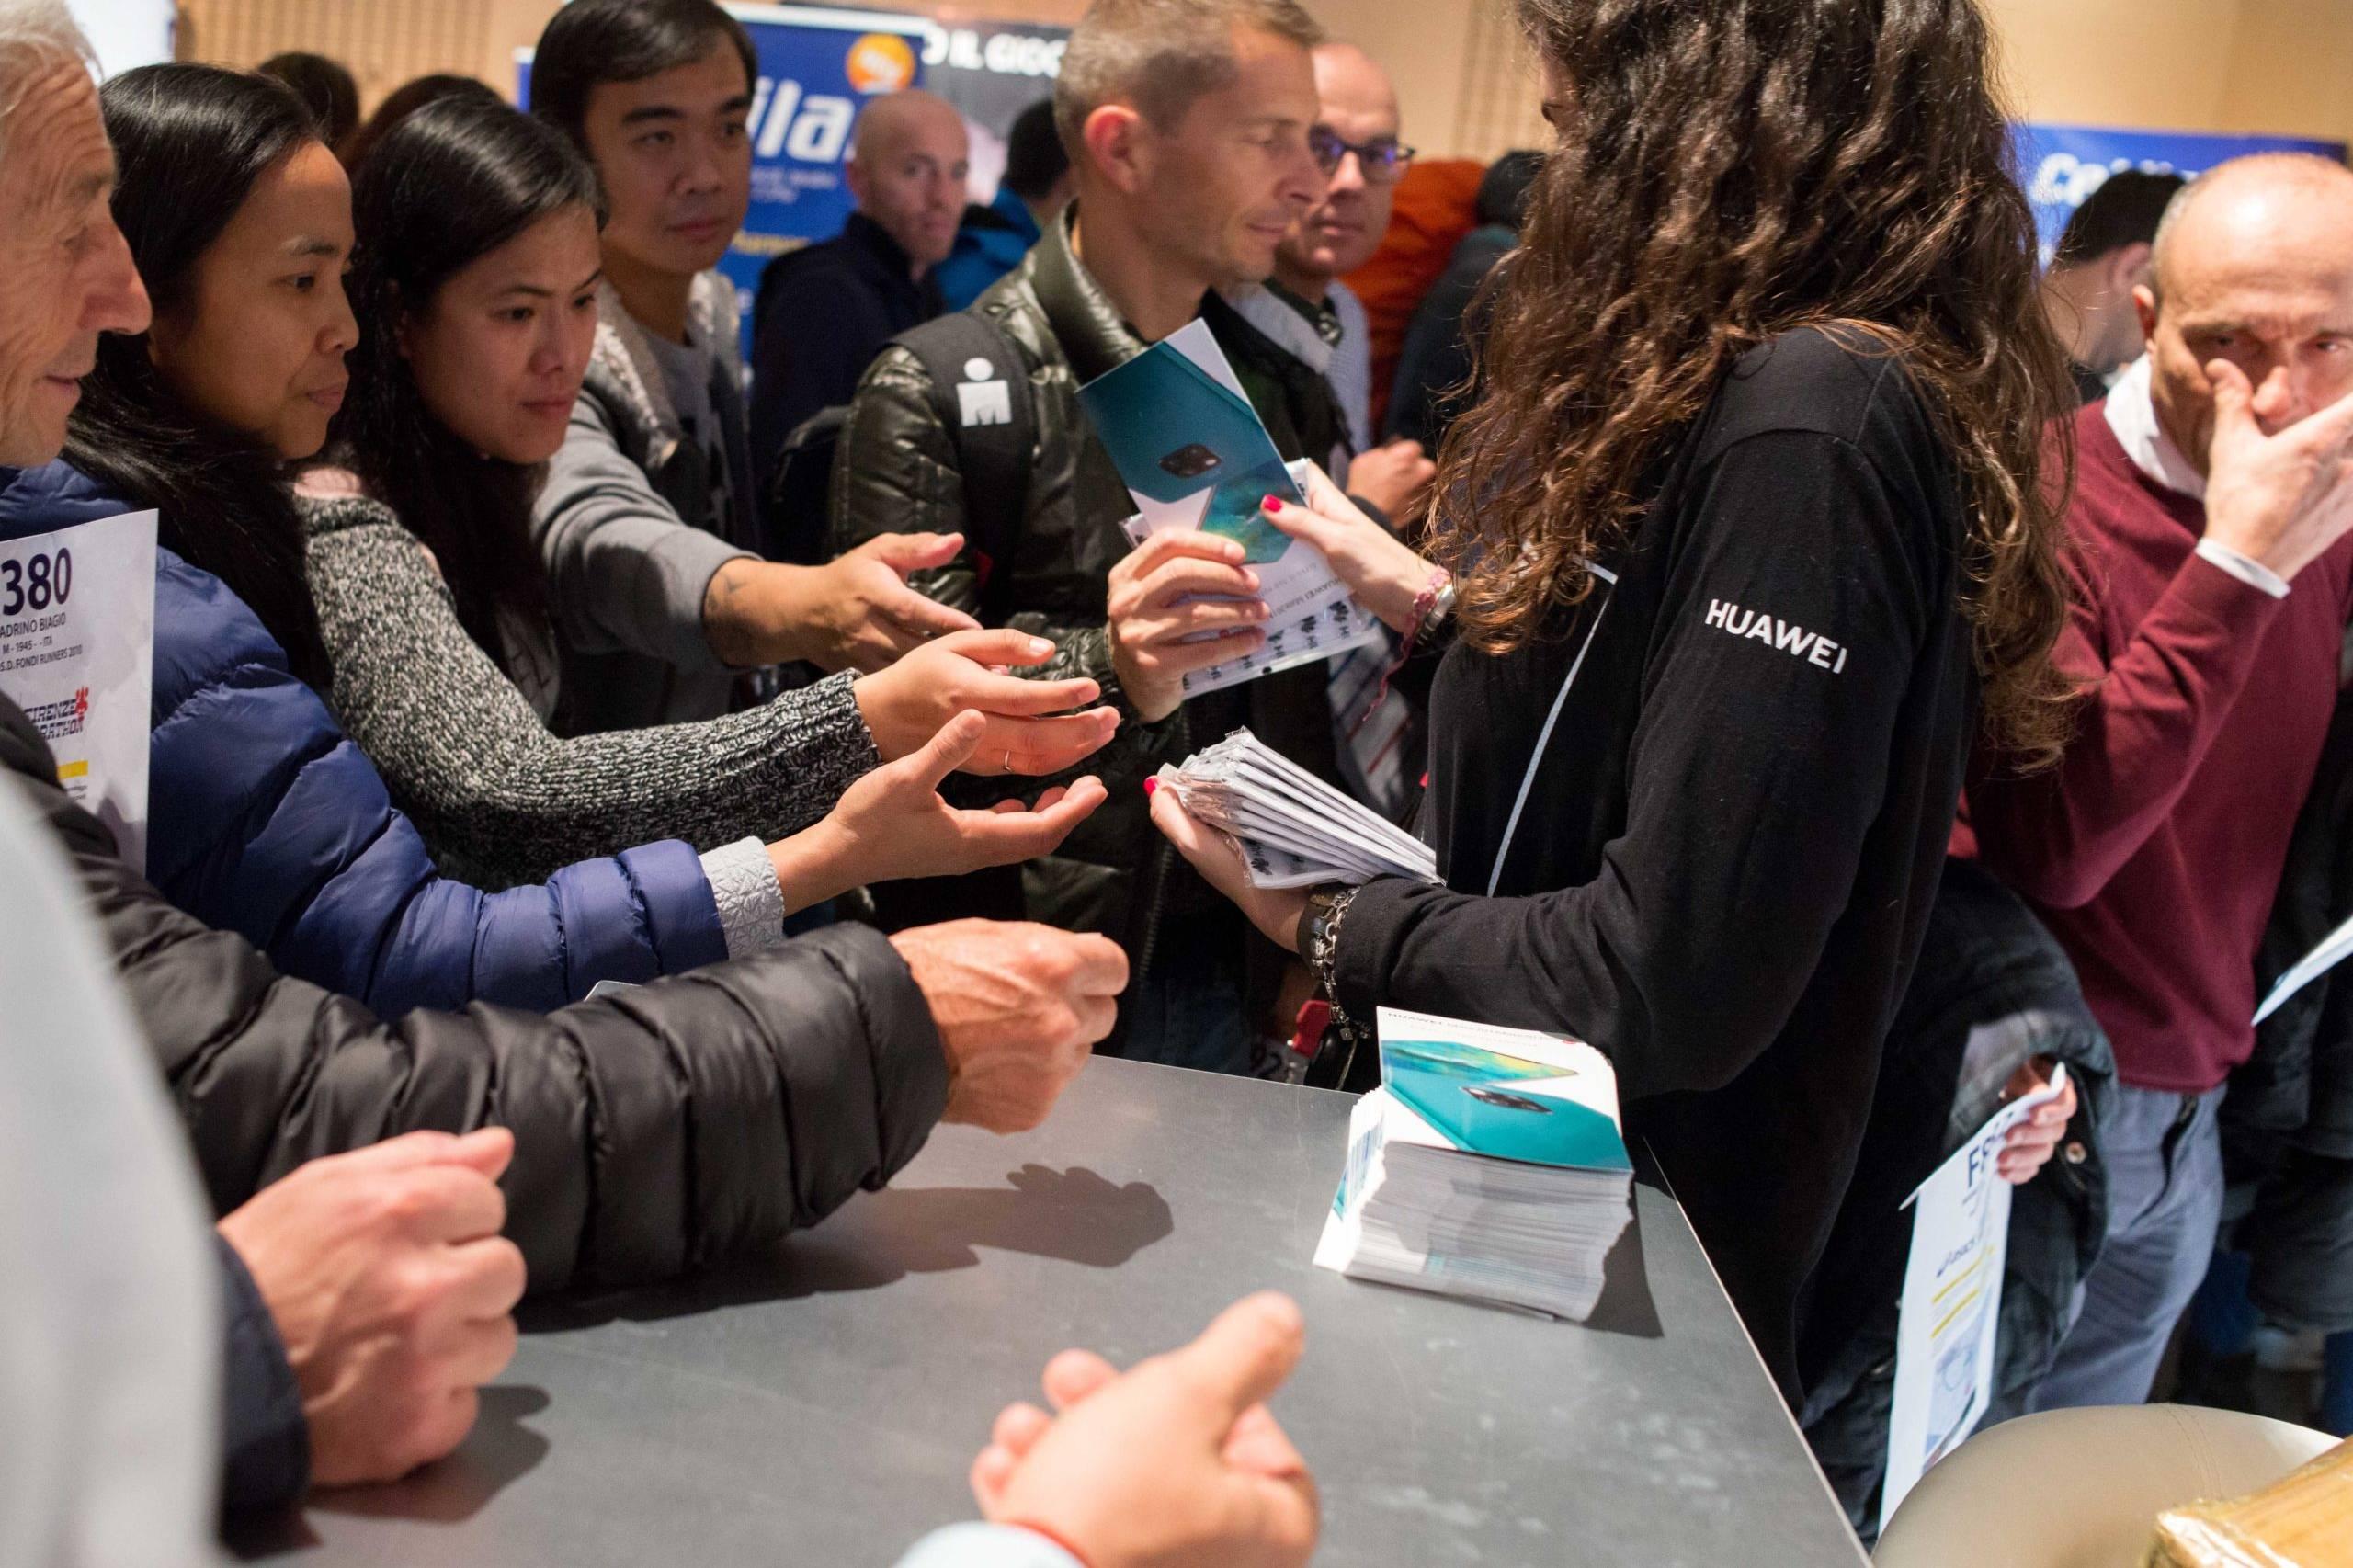 Distribuzione del materiale Huawei